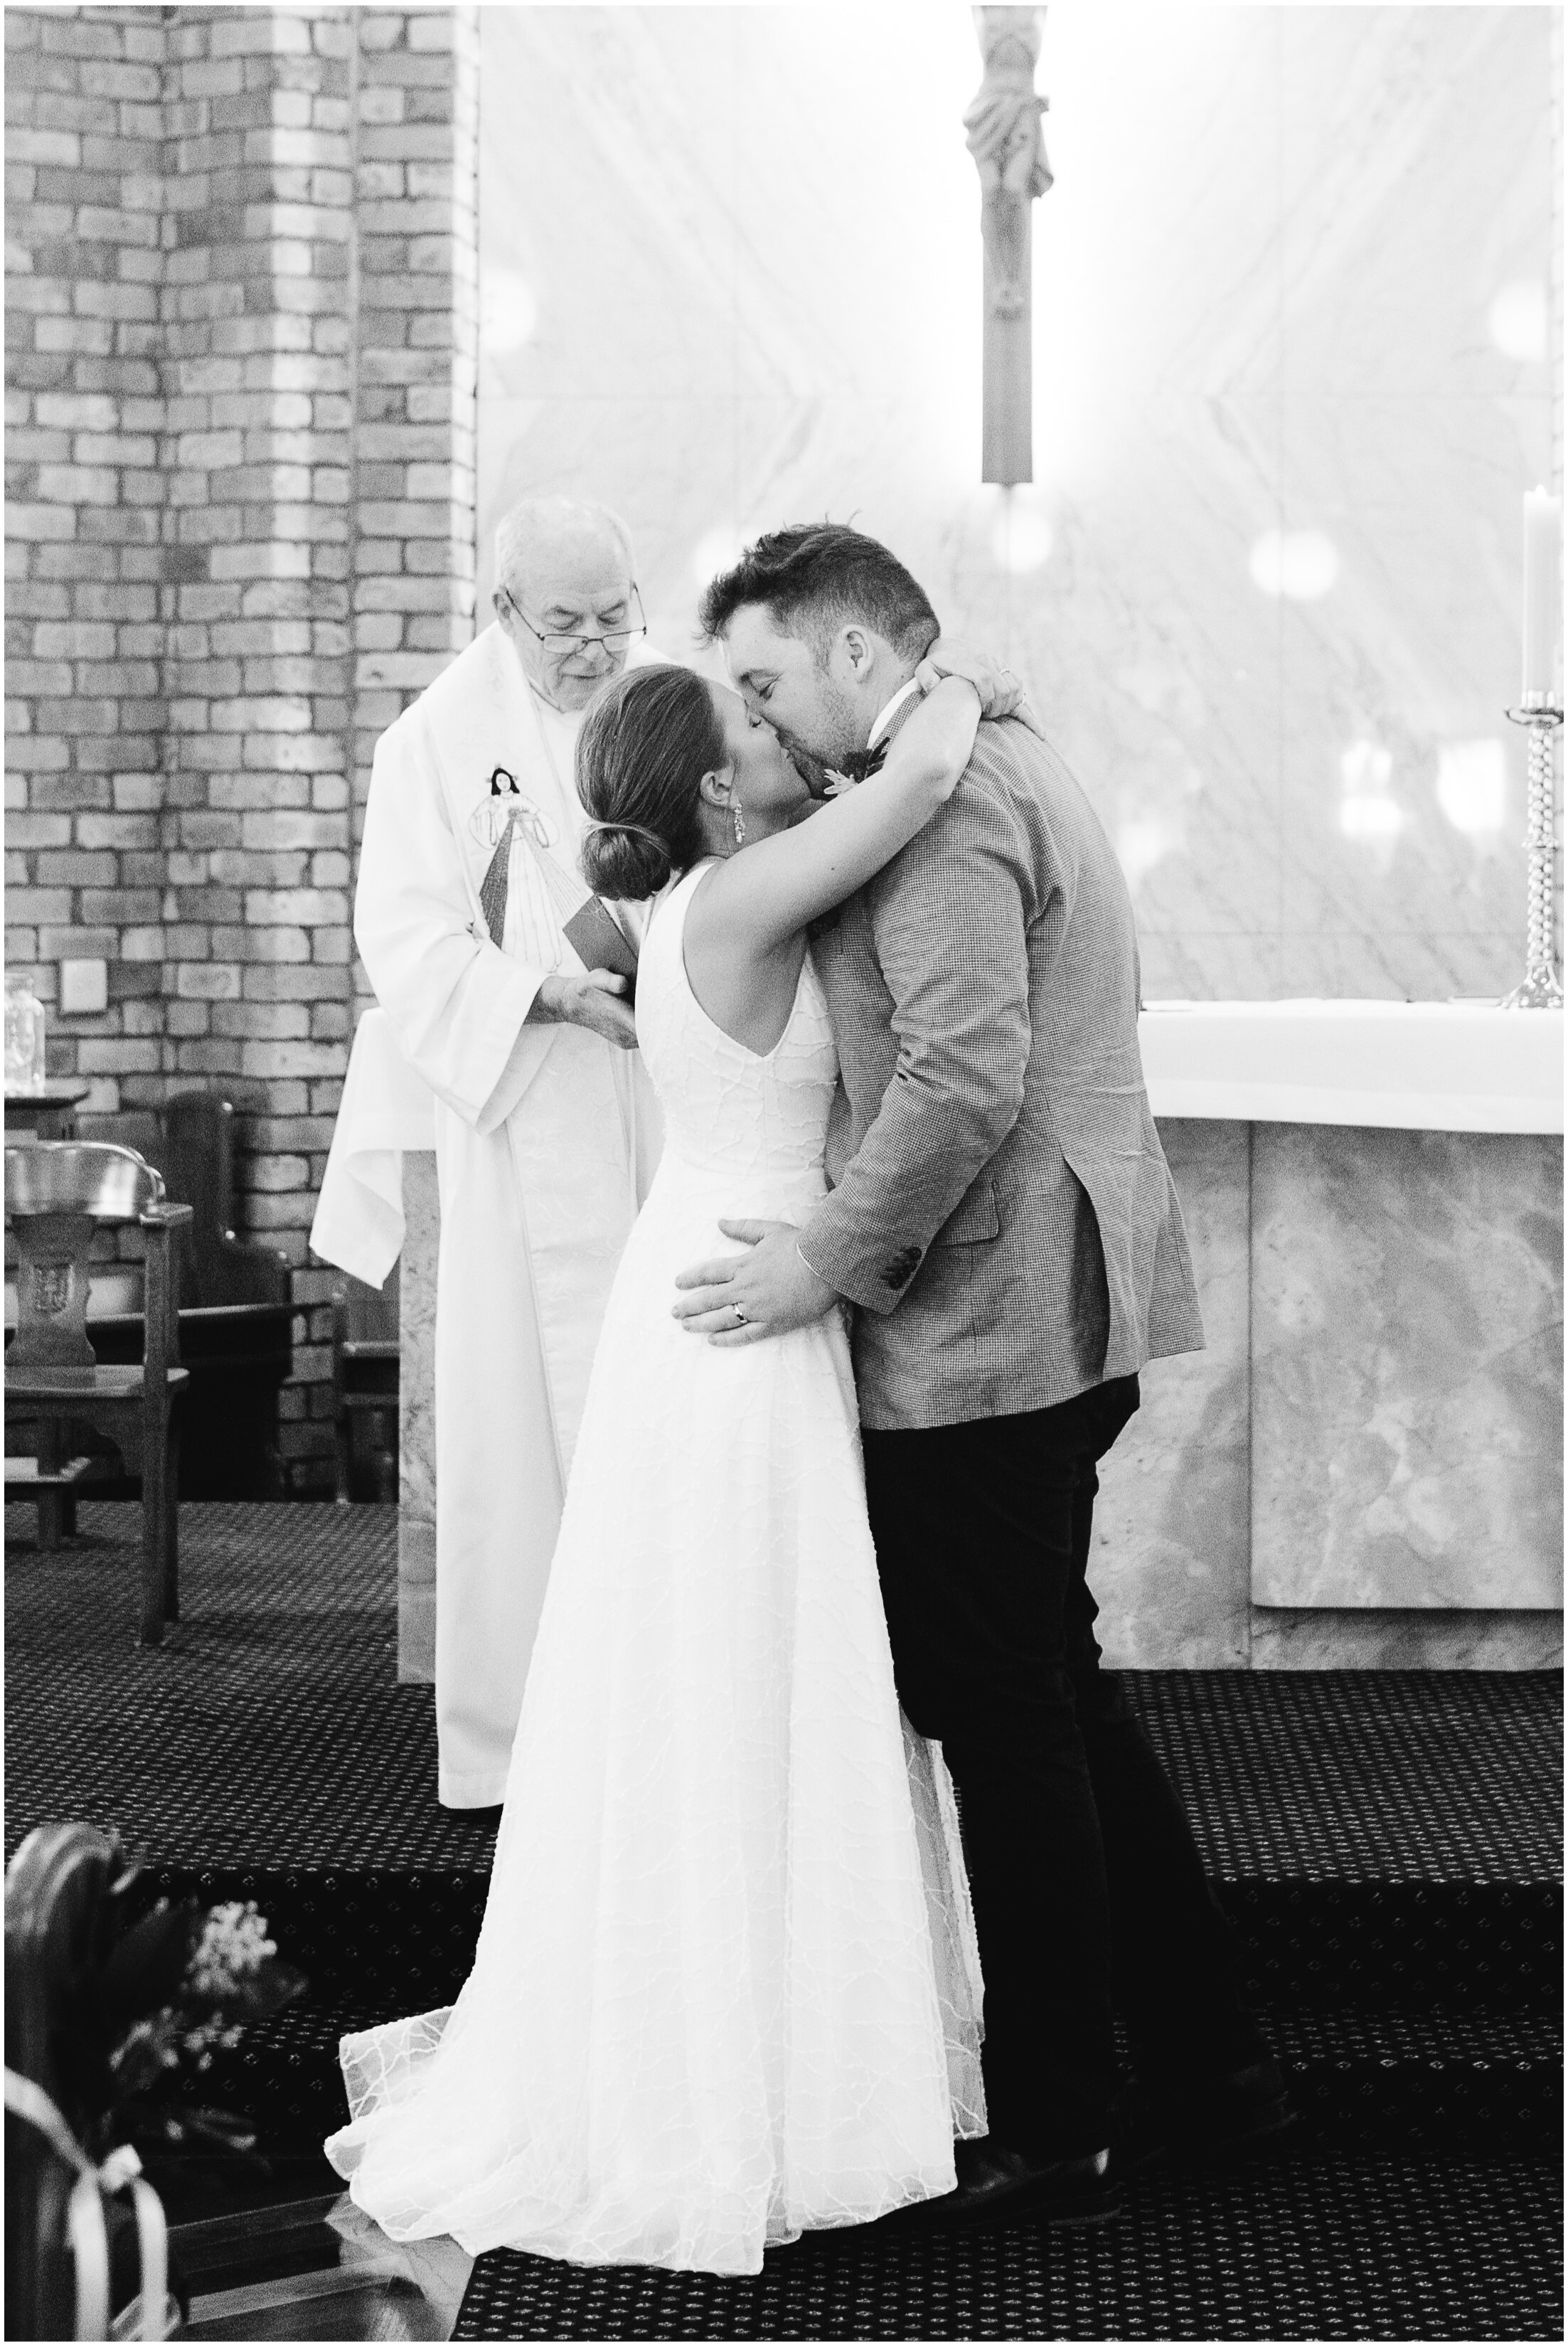 refinery-brisbane-wedding-photography-film-photographer-fine-art-23.jpg